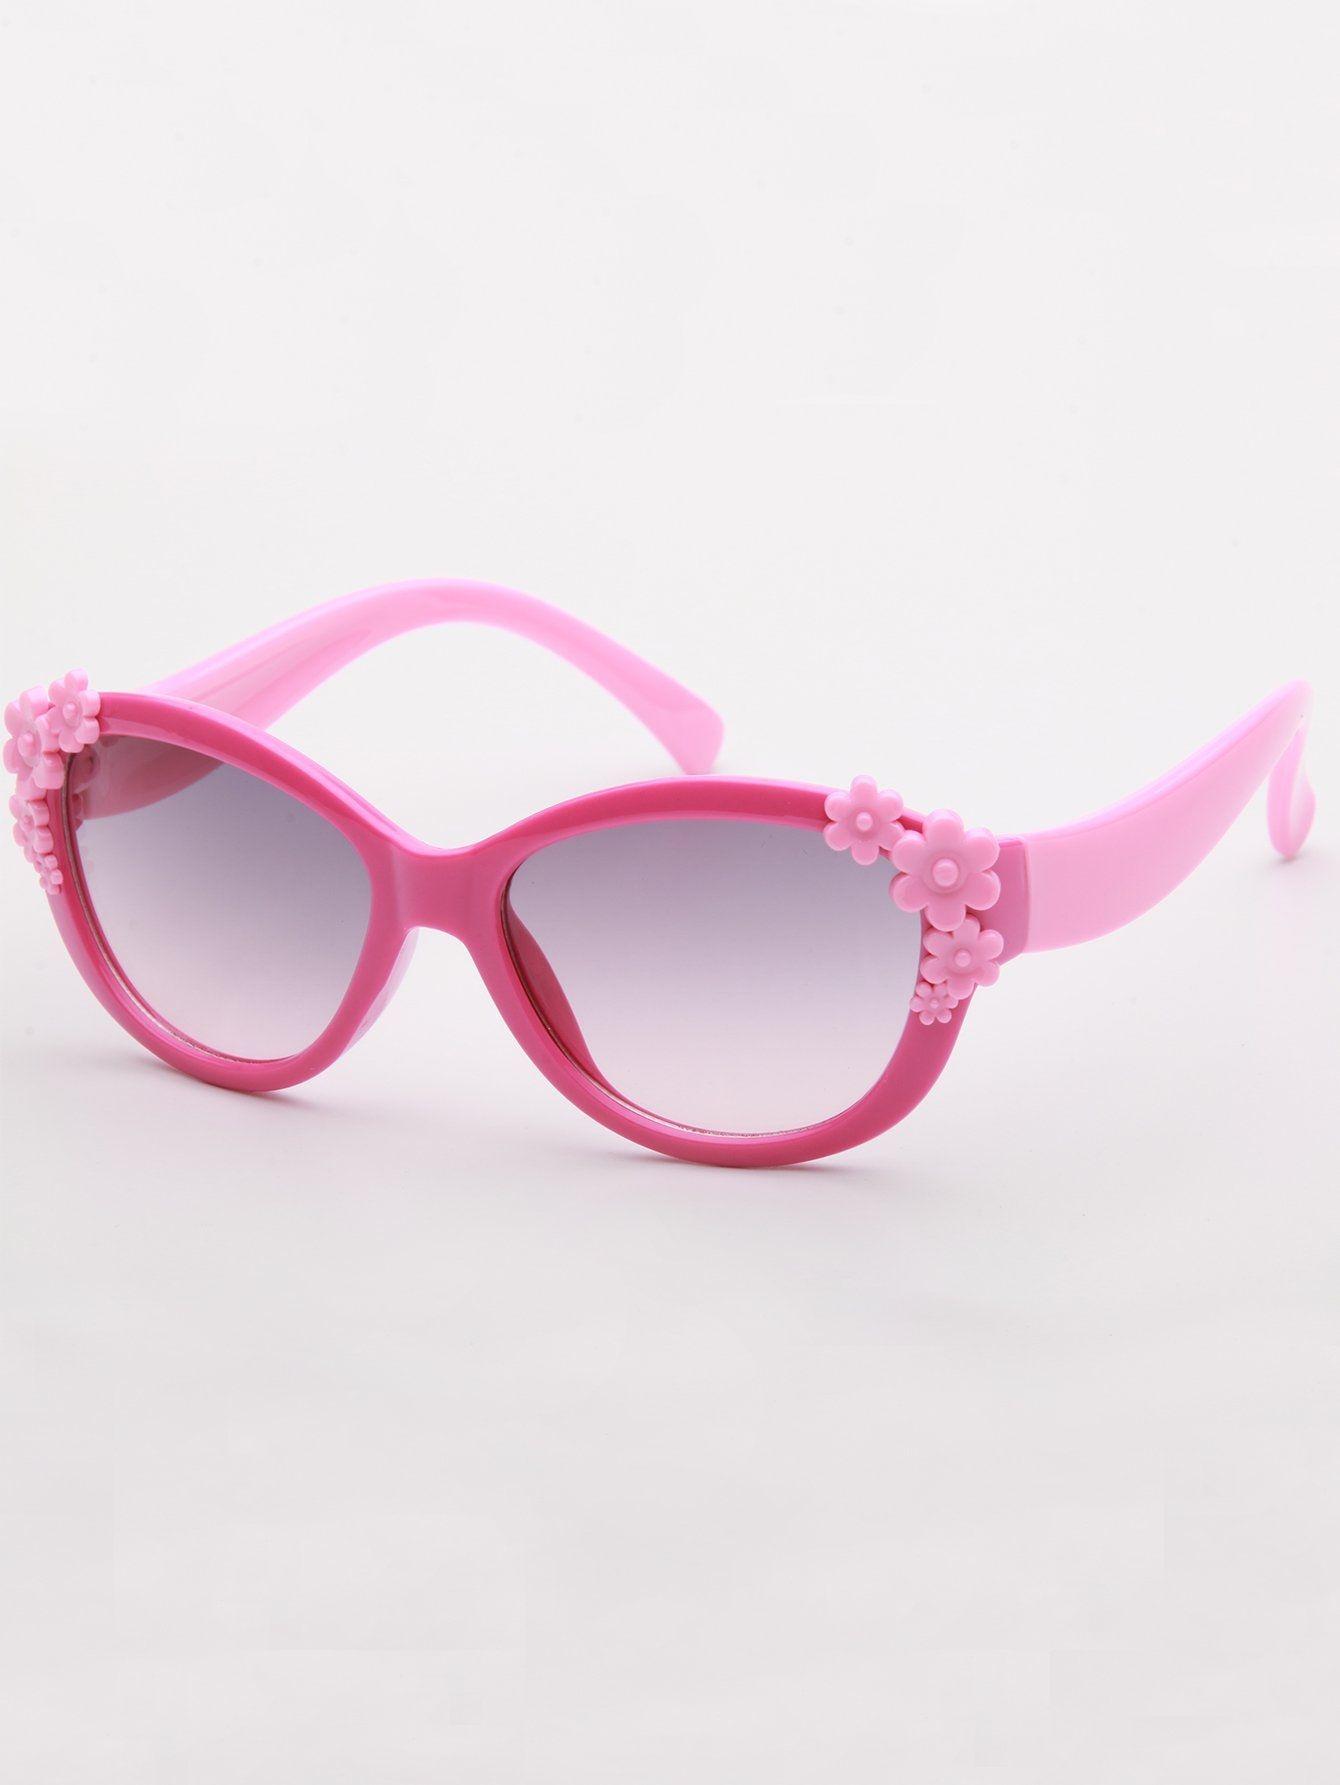 8ce55b1cb8 SHEIN Girls Flower Decor Heart Shaped Sunglasses | Shoes Accessories ...